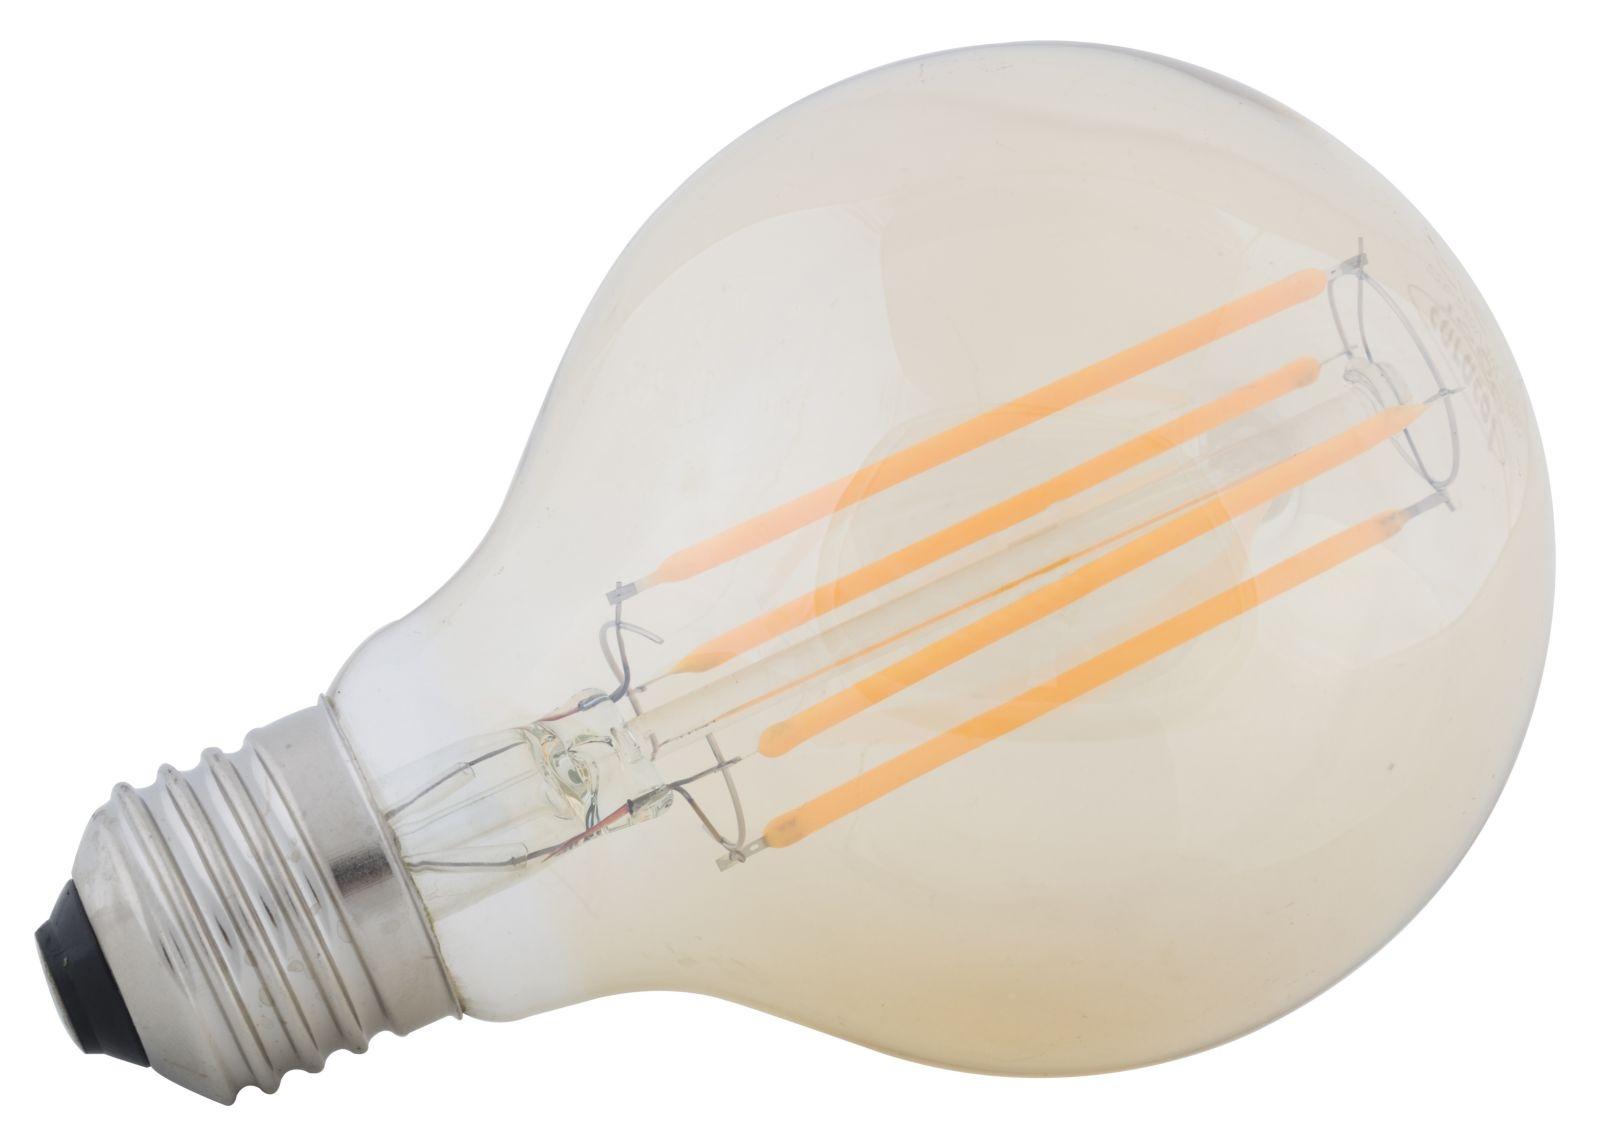 Bec LED Amber G80, 4W, Ø7,5xH11 cm imagine